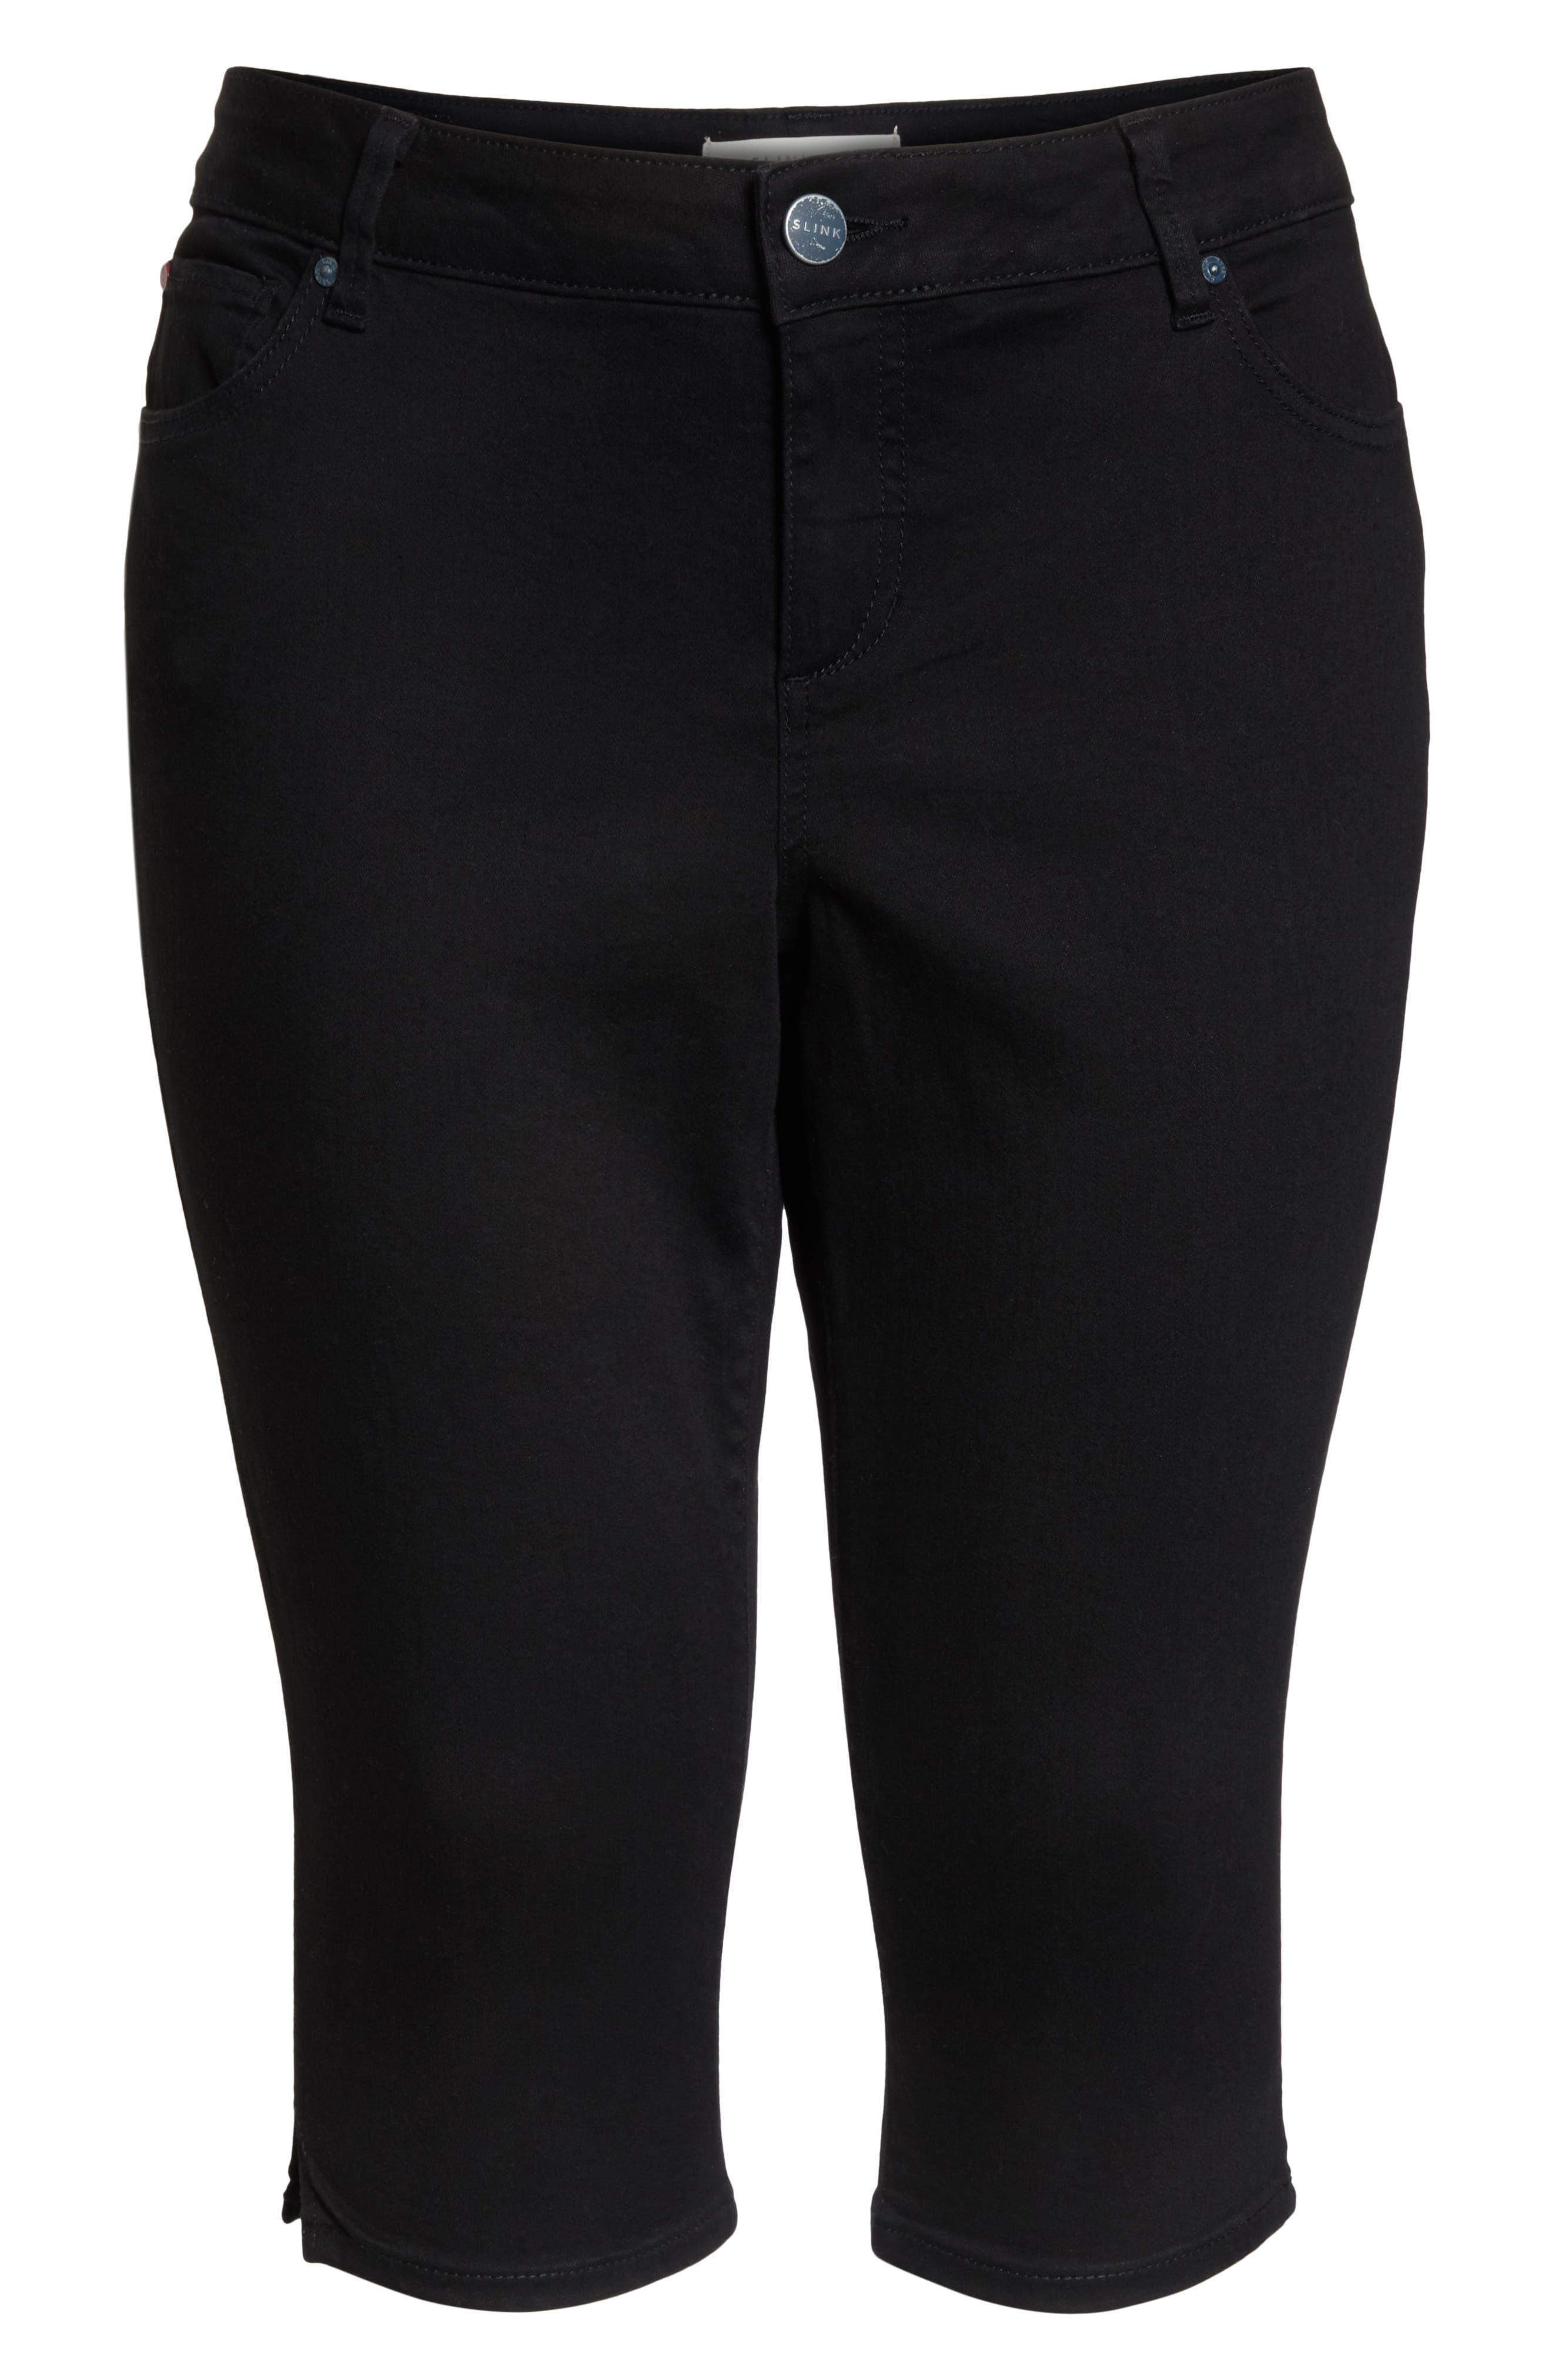 SLINK JEANS, Pirate Capri Skinny Jeans, Alternate thumbnail 5, color, BLACK